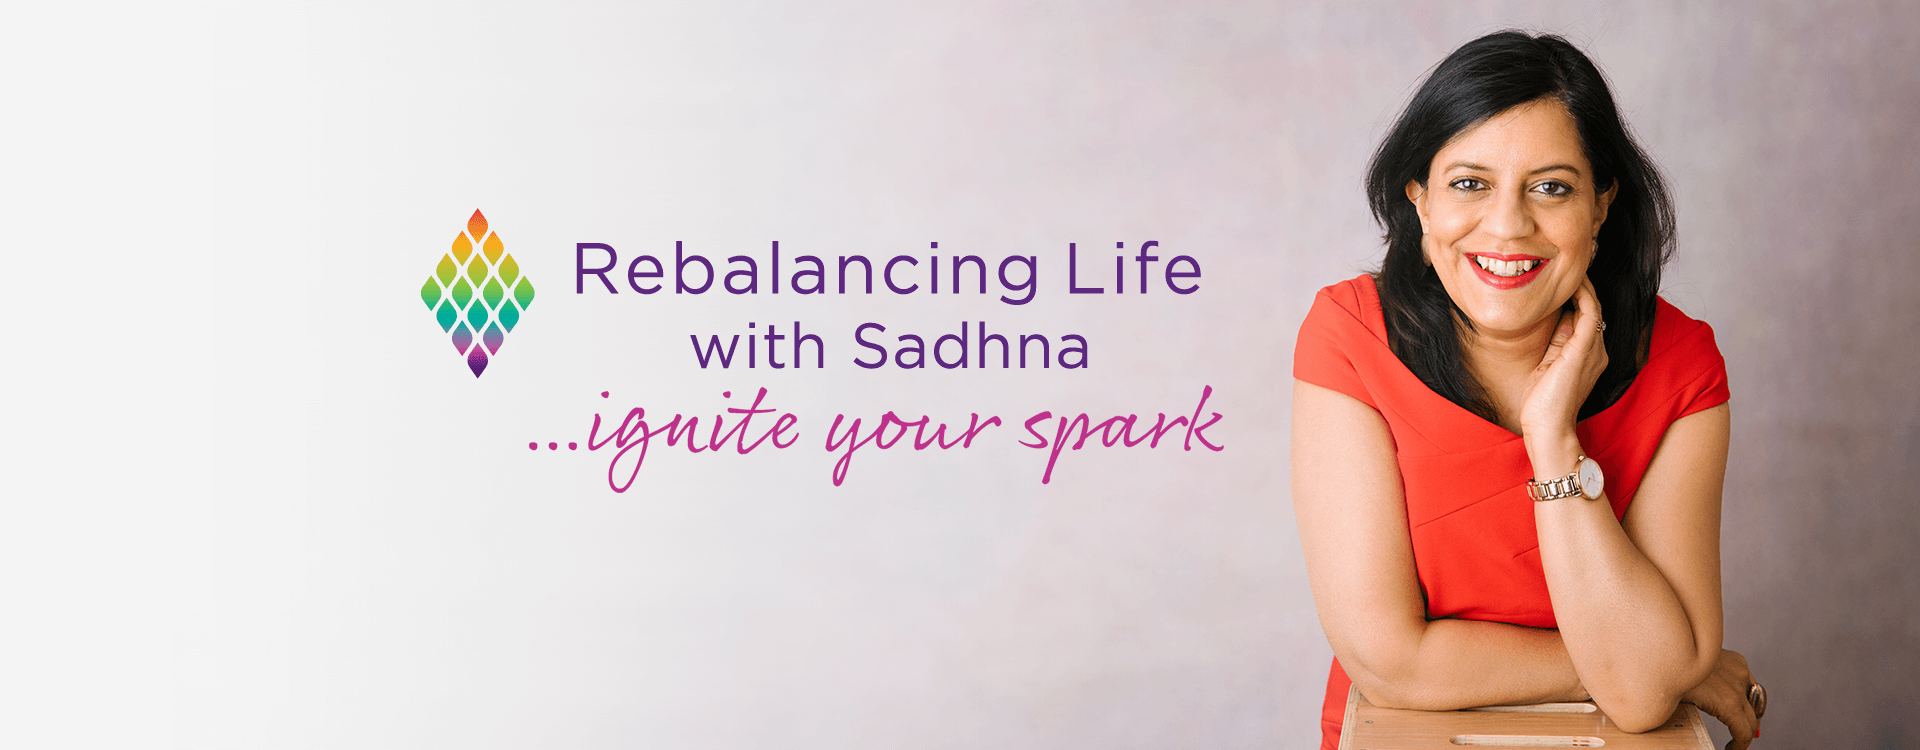 Rebalancing Life with Sadhna … ignite your spark